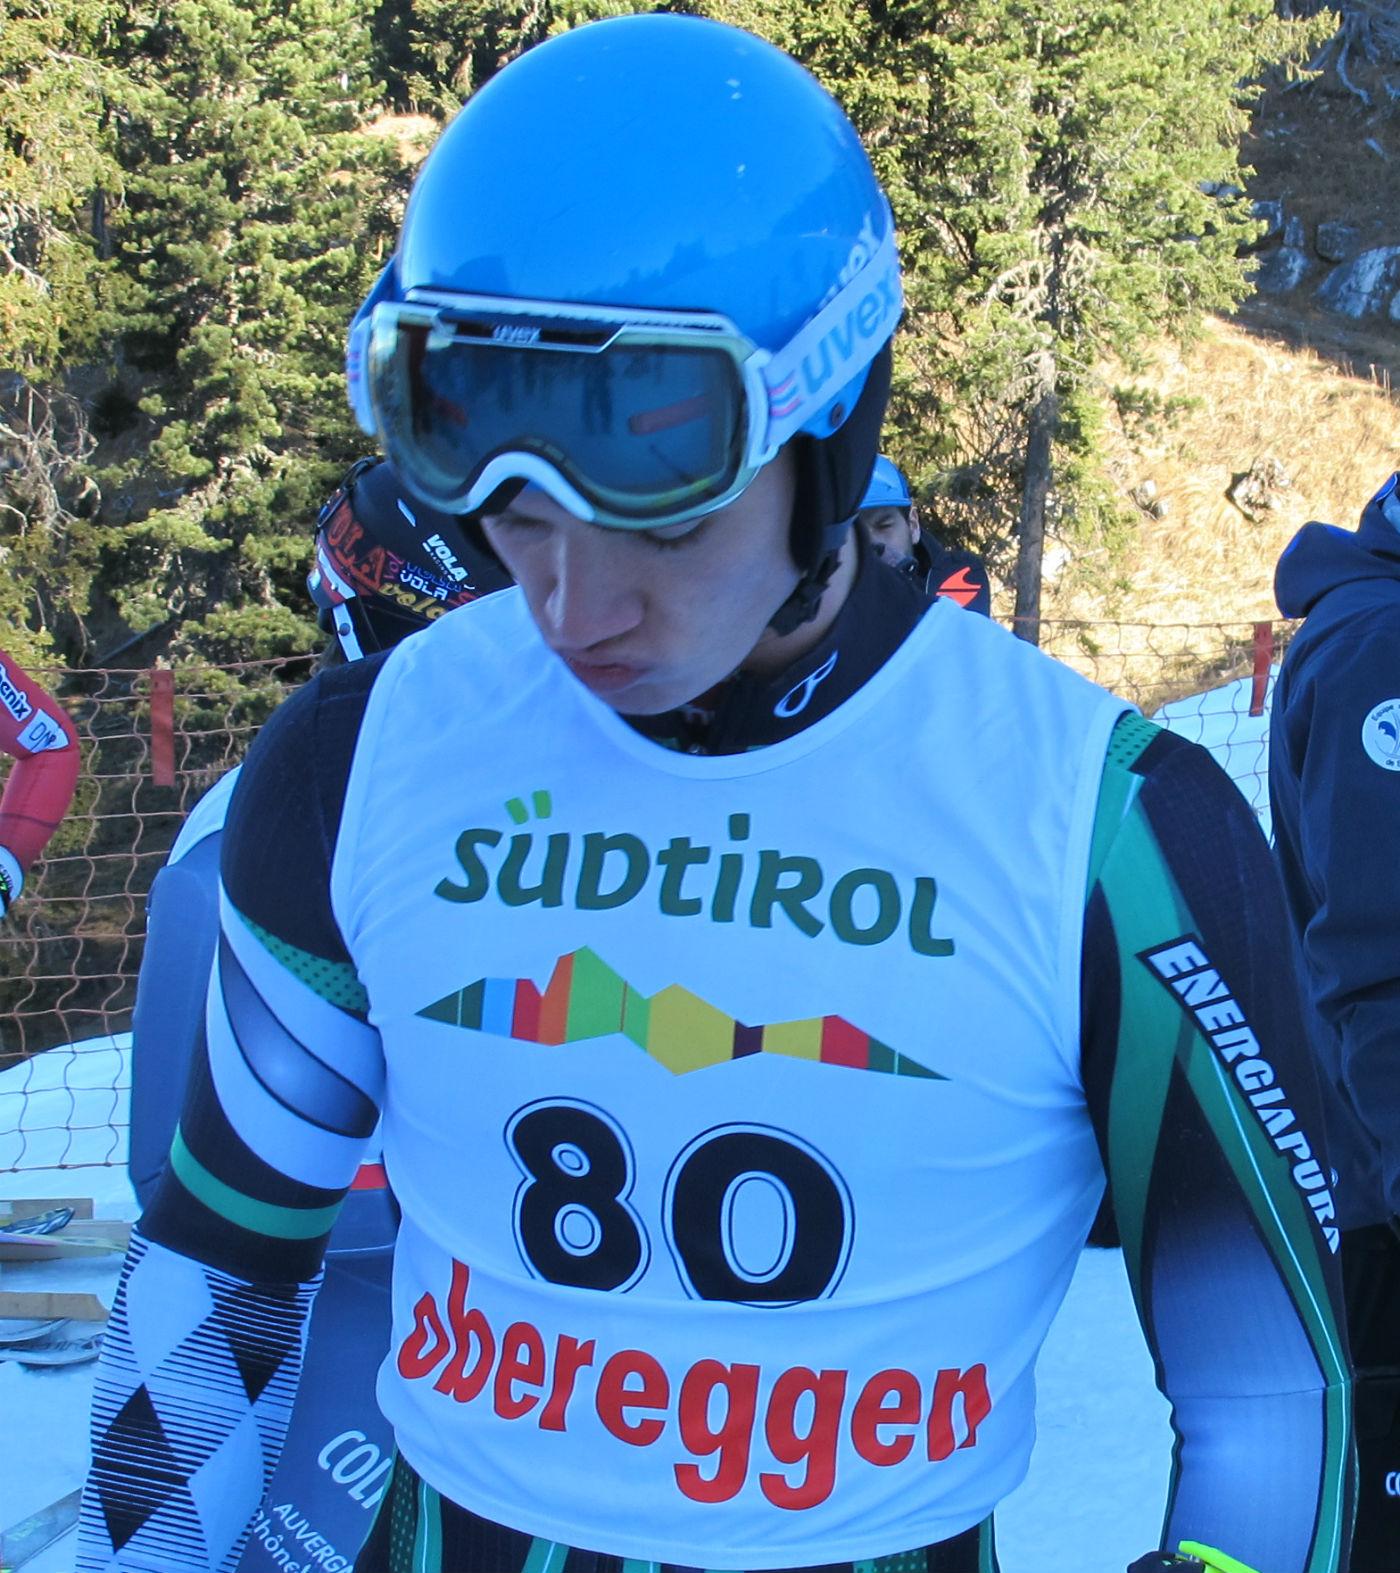 Nicolò Menegalli in partenza a Obereggen in Coppa Europa @Gabriele Pezzaglia